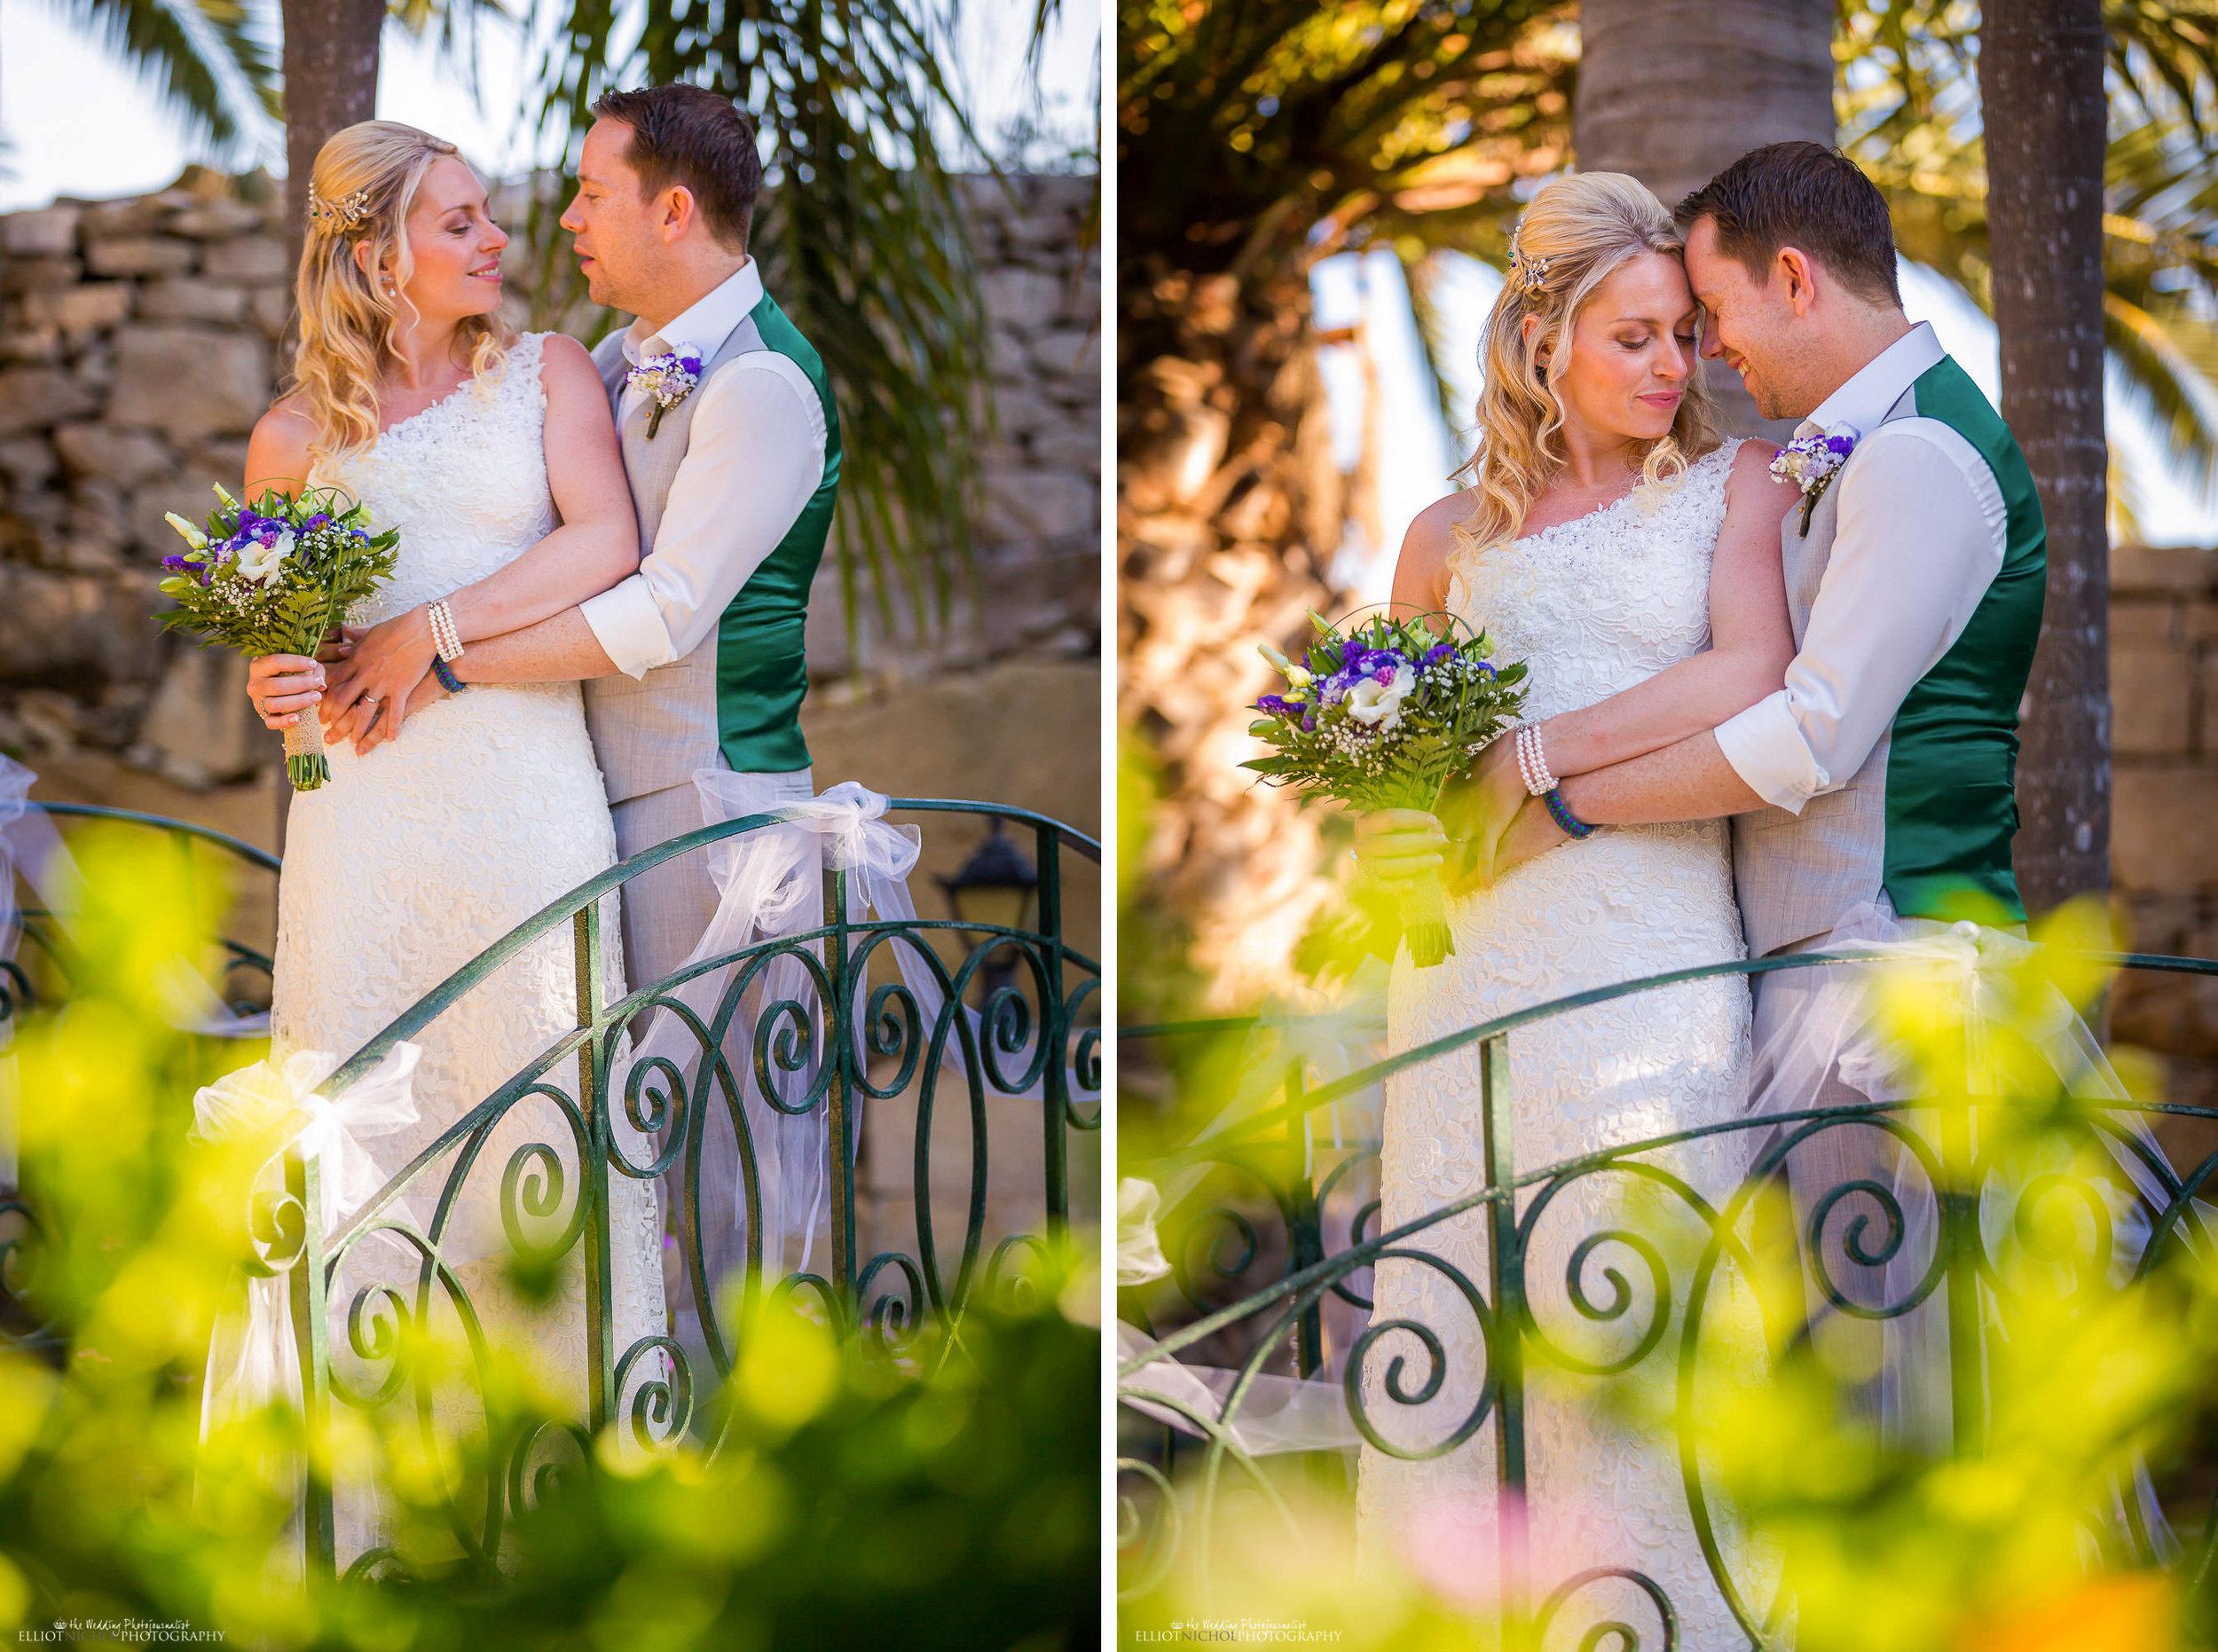 bride-groom-wedding-photo-photographer-destination-photography-portrait